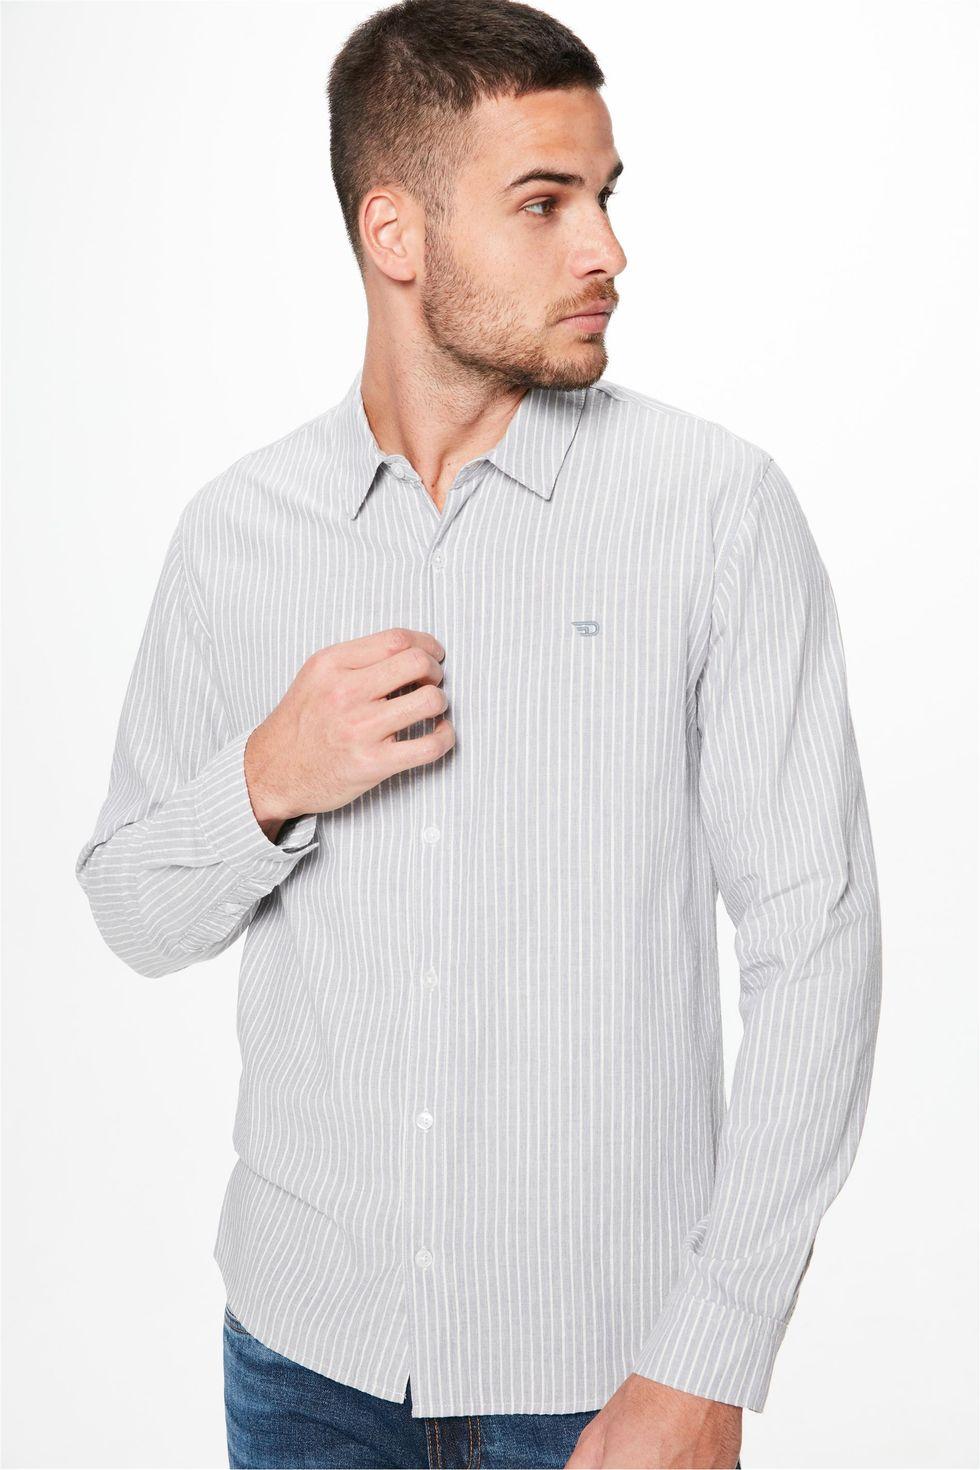 Camisa-Manga-Longa-Listrada-Masculina-Frente--